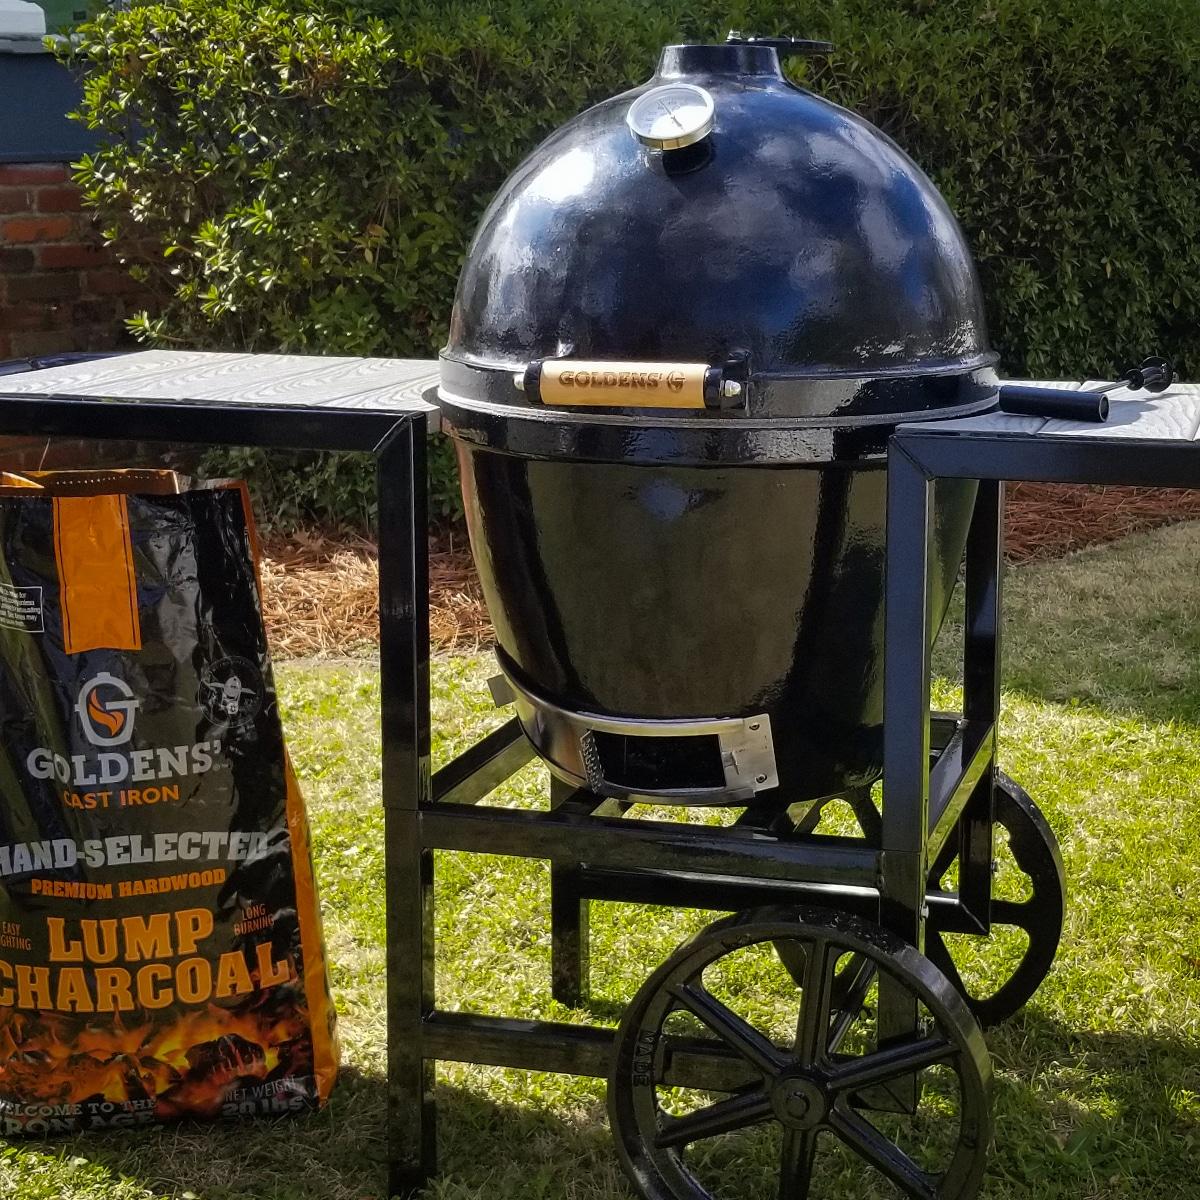 Goldens Cast Iron Grilled Steak Ribeye Kamado Recipe